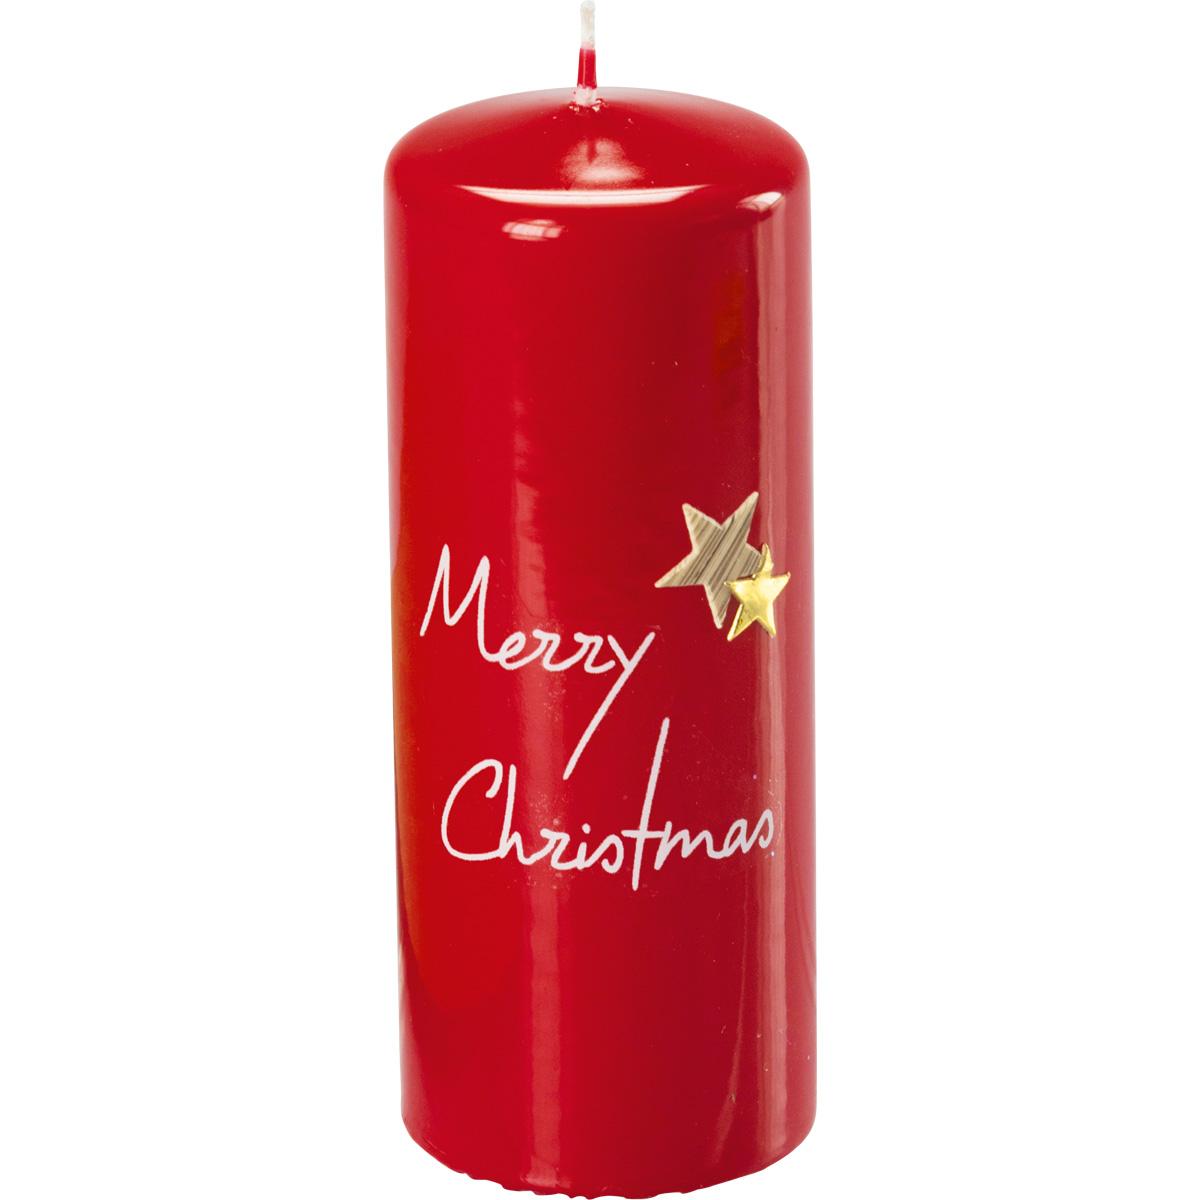 Weihnachtskerze, 3016, 15 x 6 cm, rubin, Merry Christmas